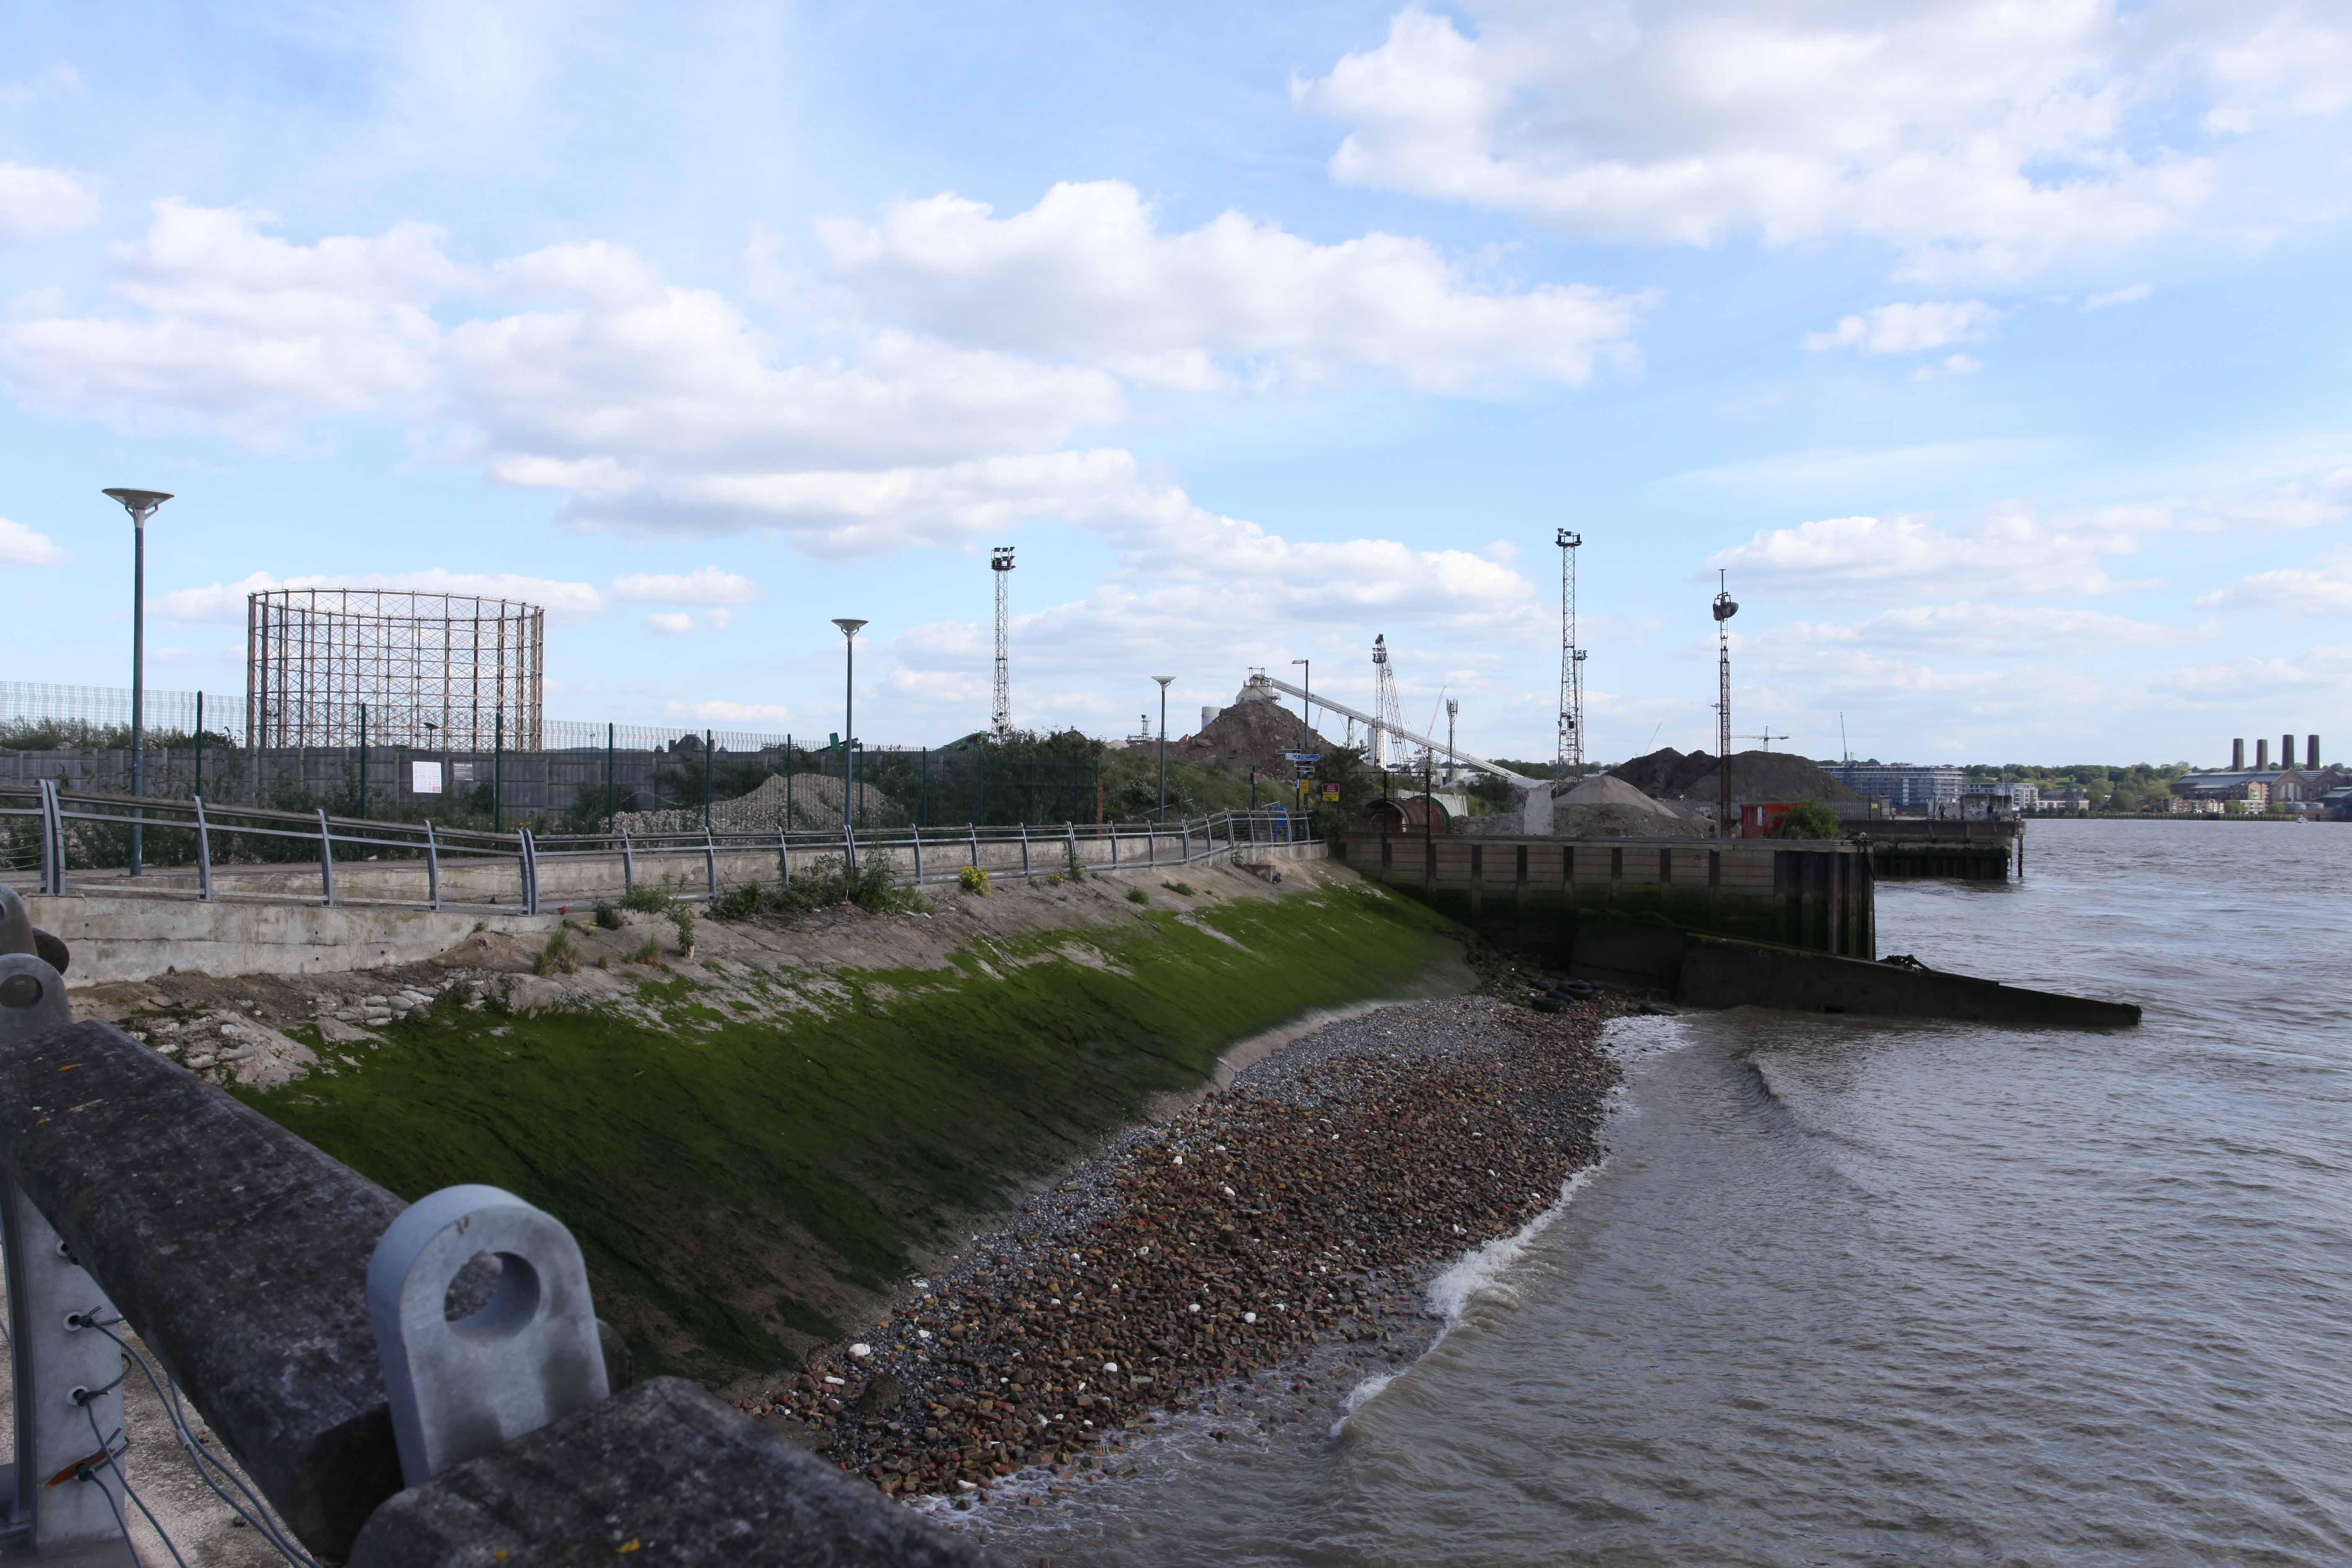 greenwich-river-walk-027